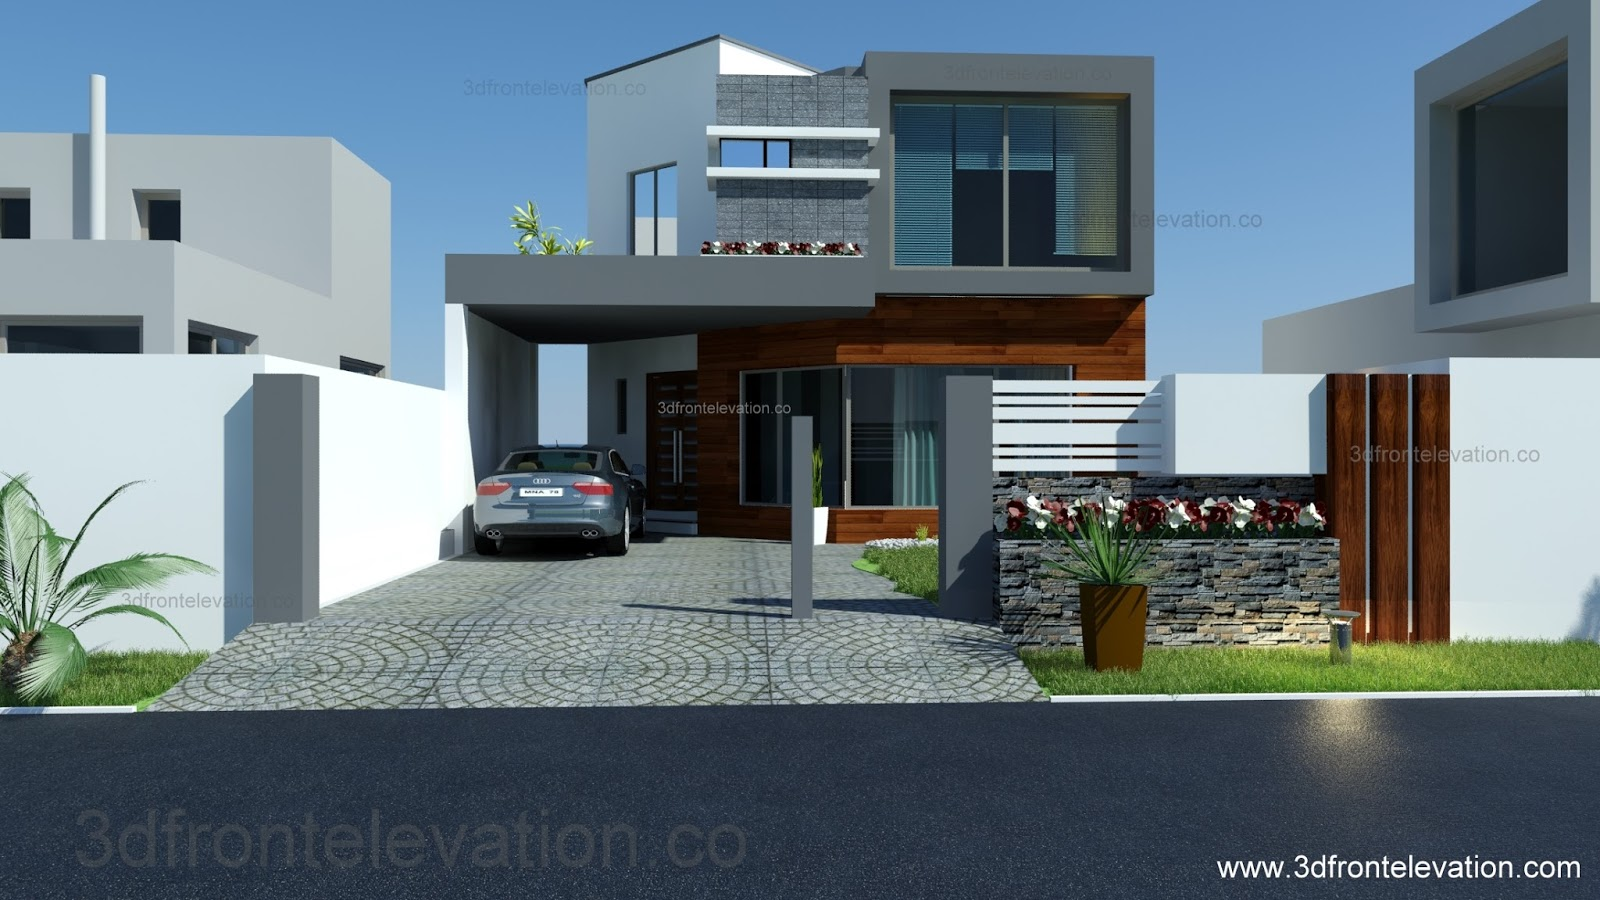 3D Front Elevation.com: 8 Marla House Plan-Layout-Elevation